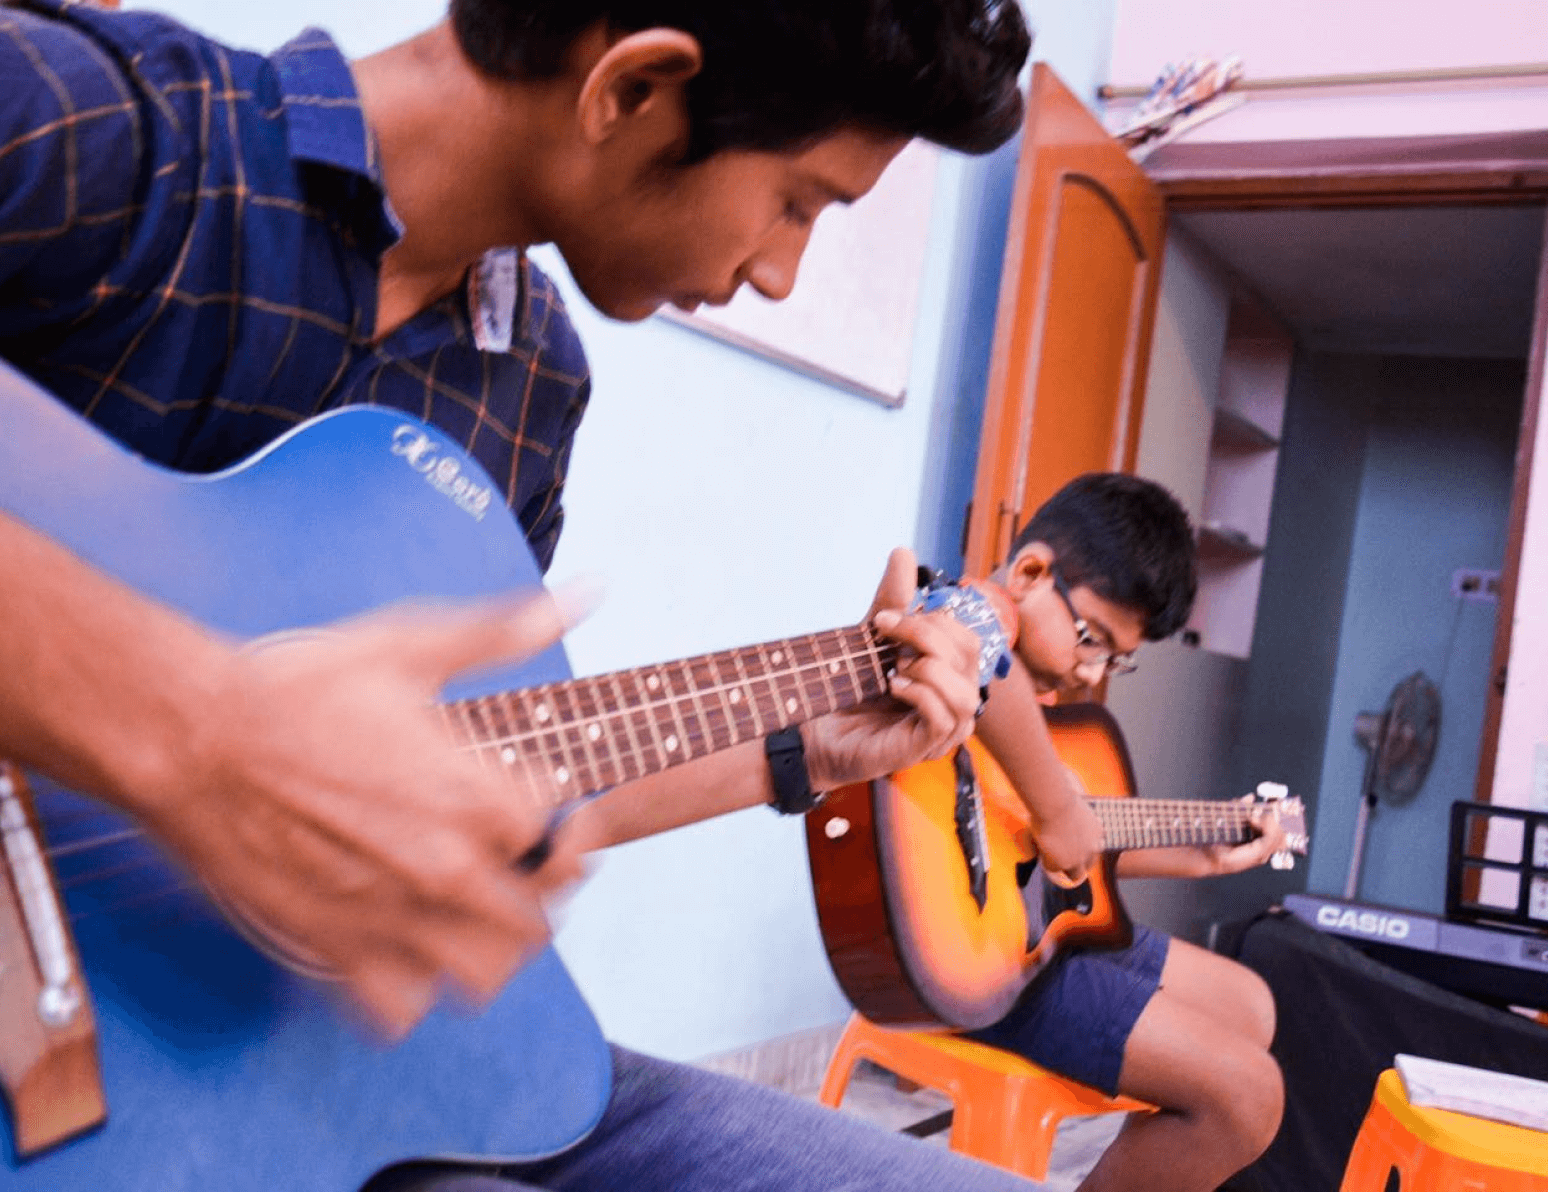 Boys learning the guitar at Melisma.